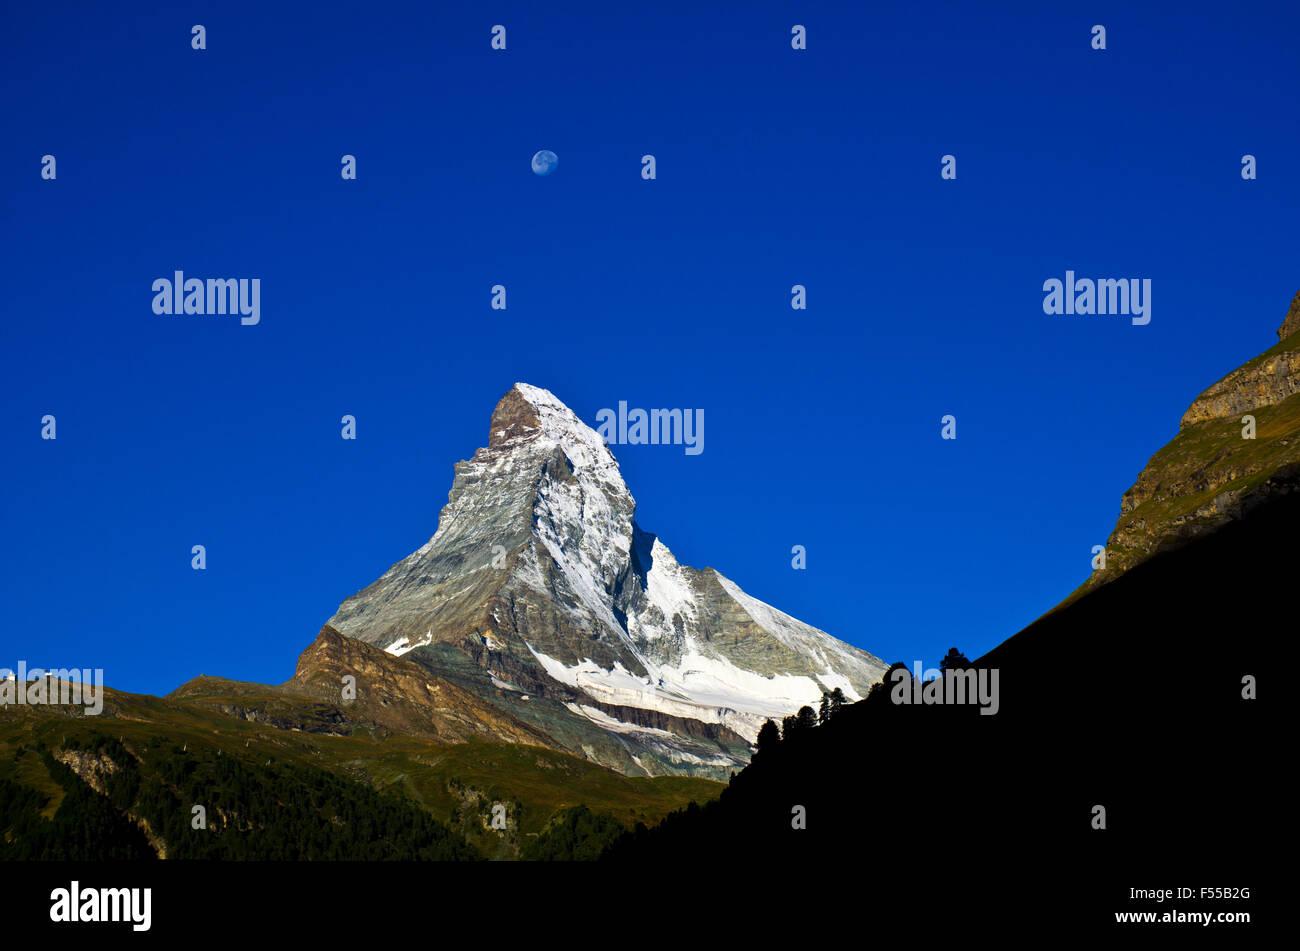 Matterhorn and moon at sunrise seen from Zermatt, Swiss alps, Valais, Wallis, Switzerland - Stock Image